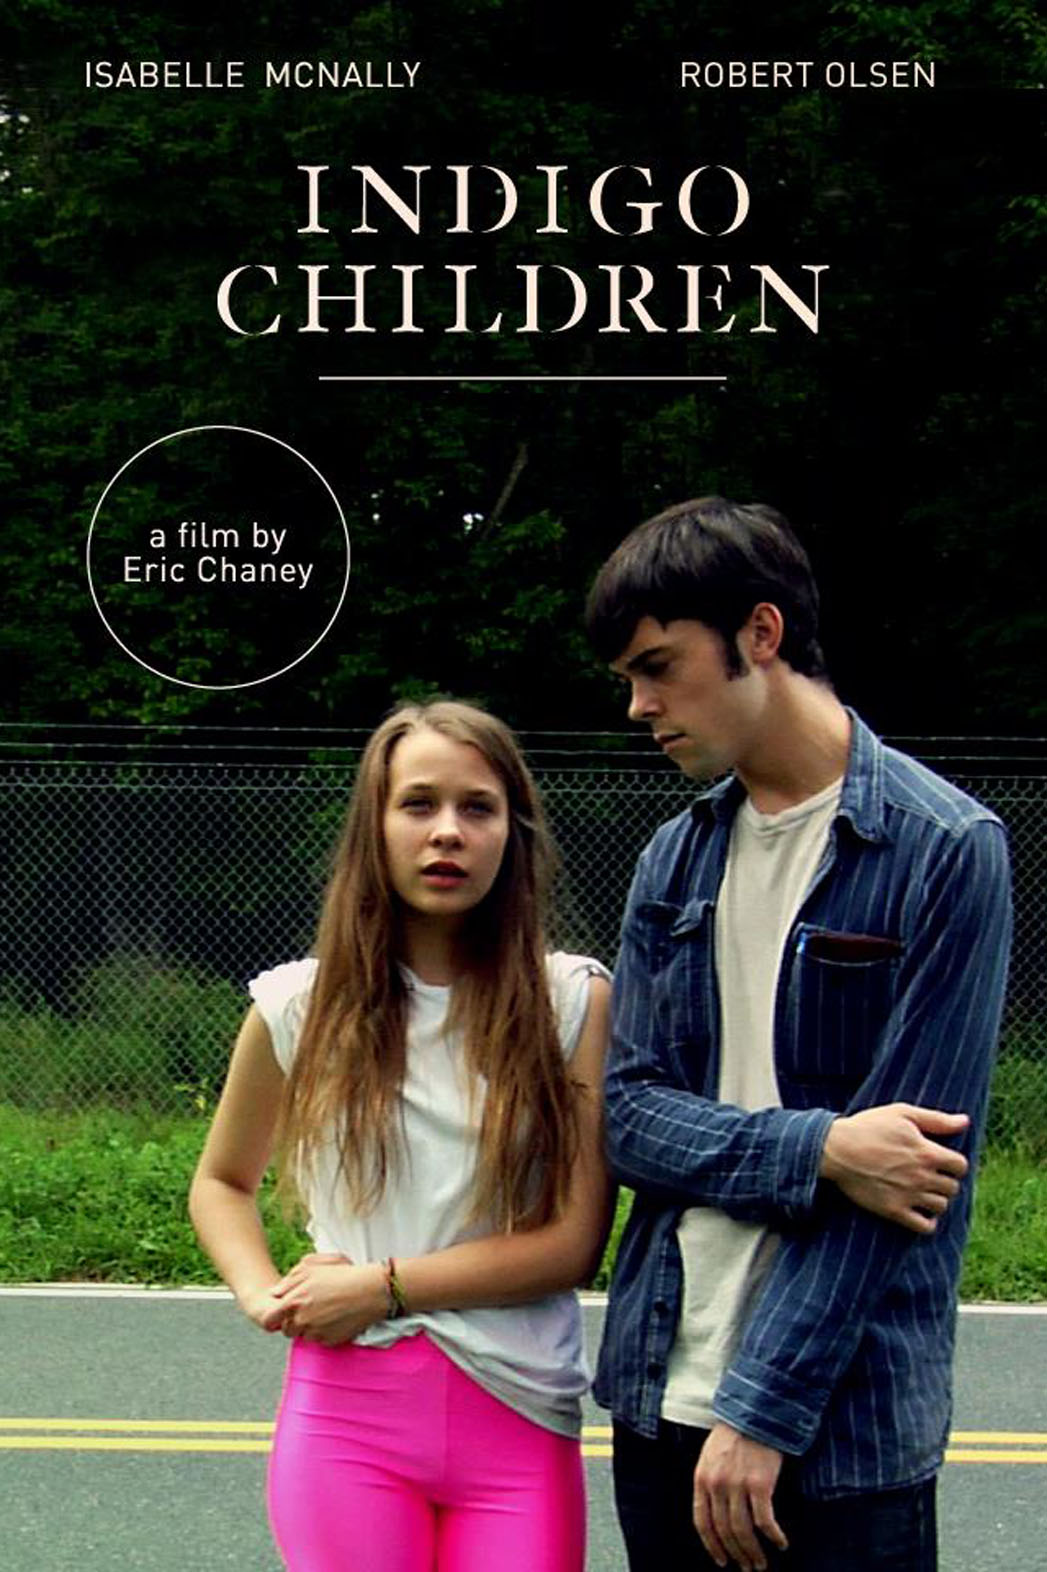 Indigo Children Poster - P 2014